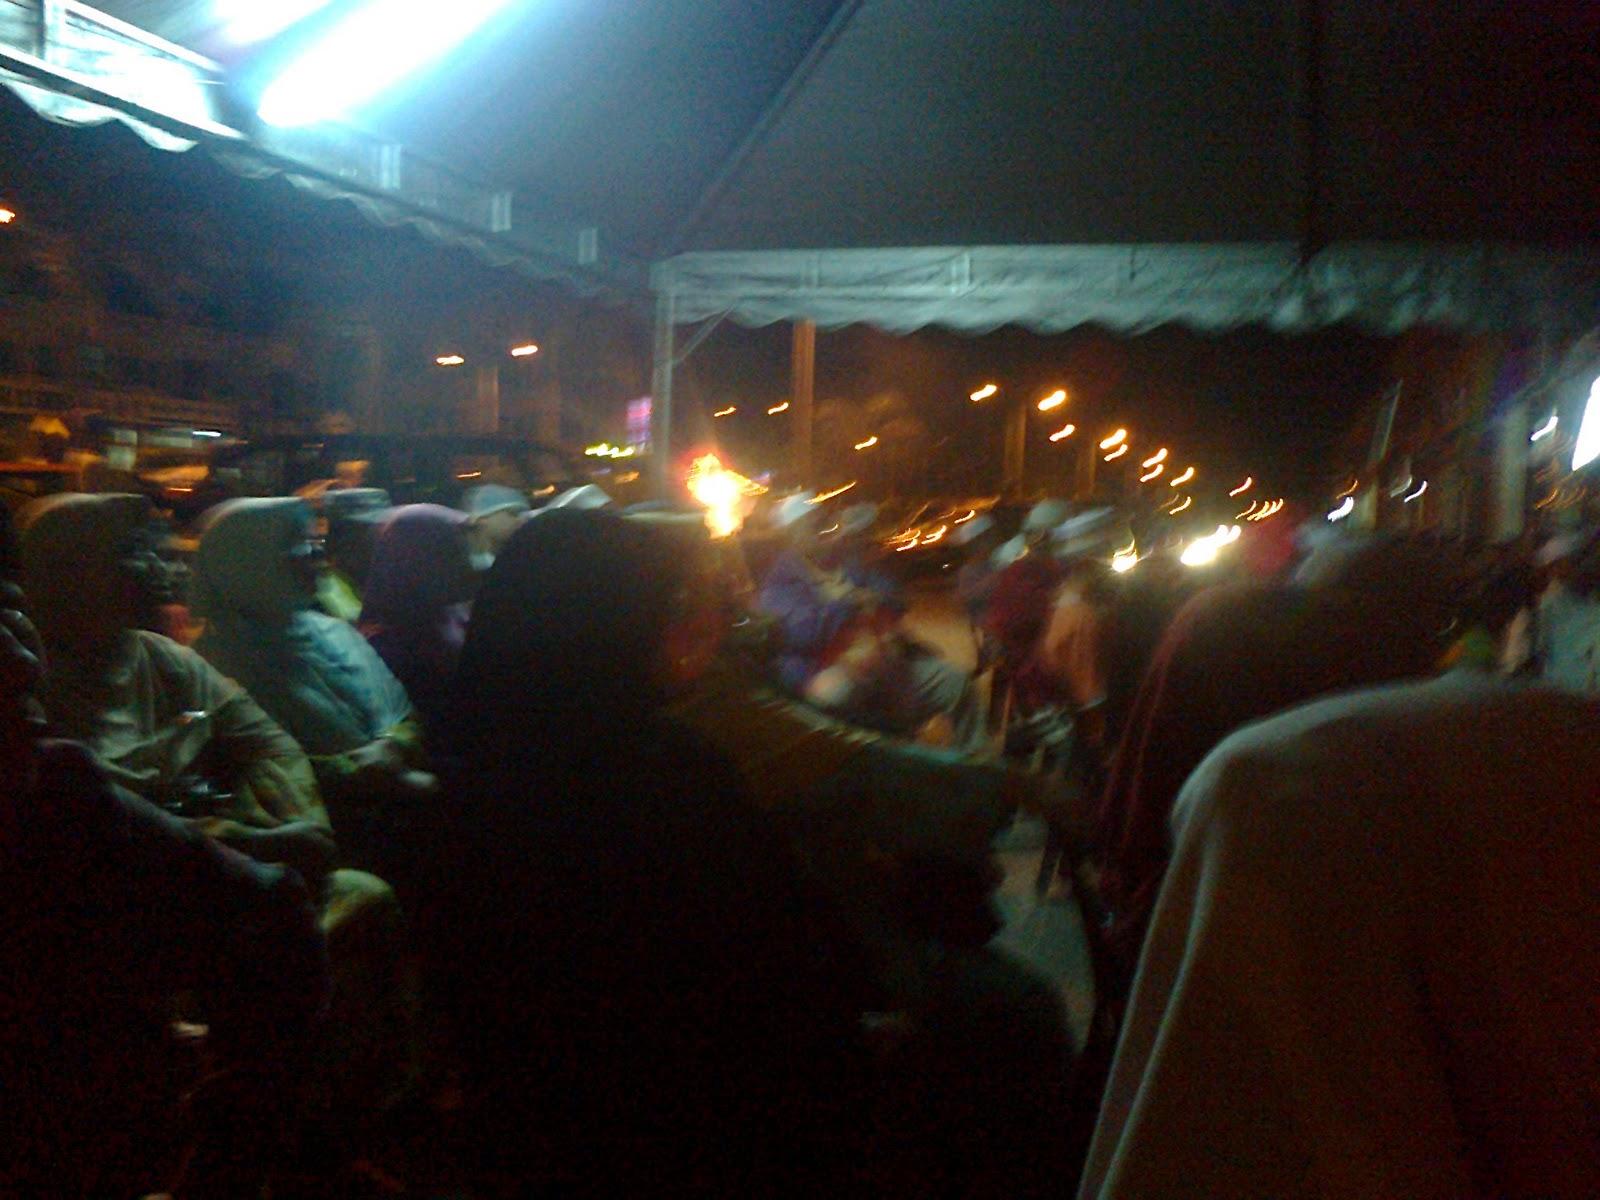 Sekitar Ceramah Kemerdekaan di Taman Meru, Ipoh, Perak